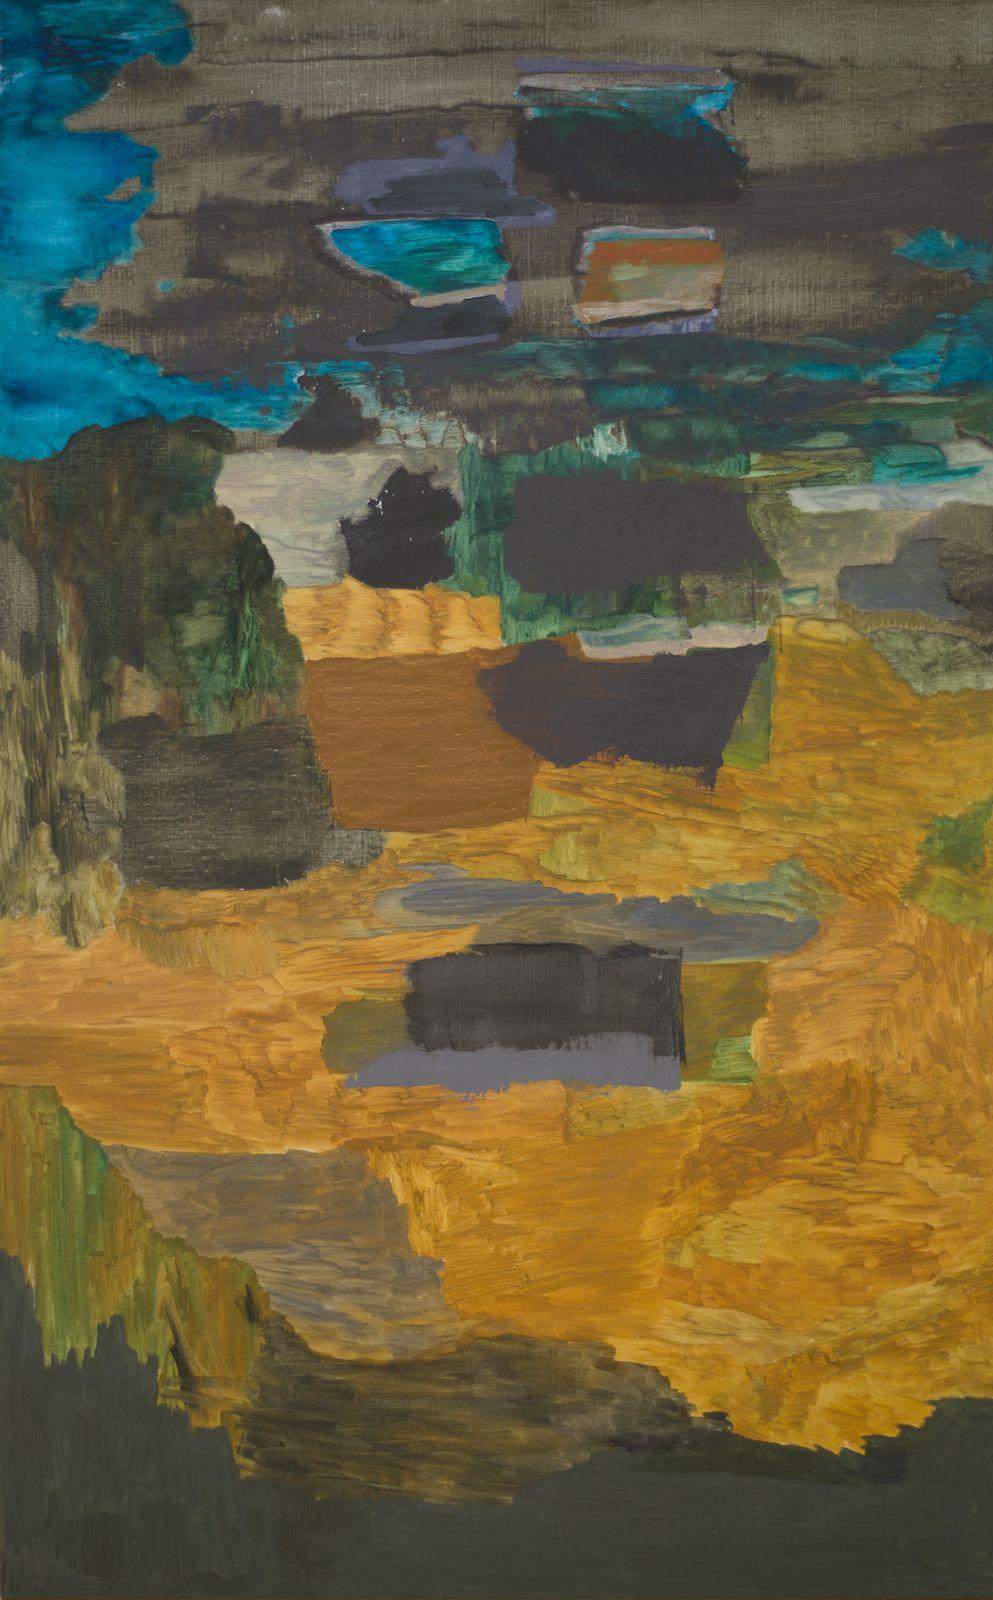 Meander VI, 2015, oil on canvas, 200 x 125 cm